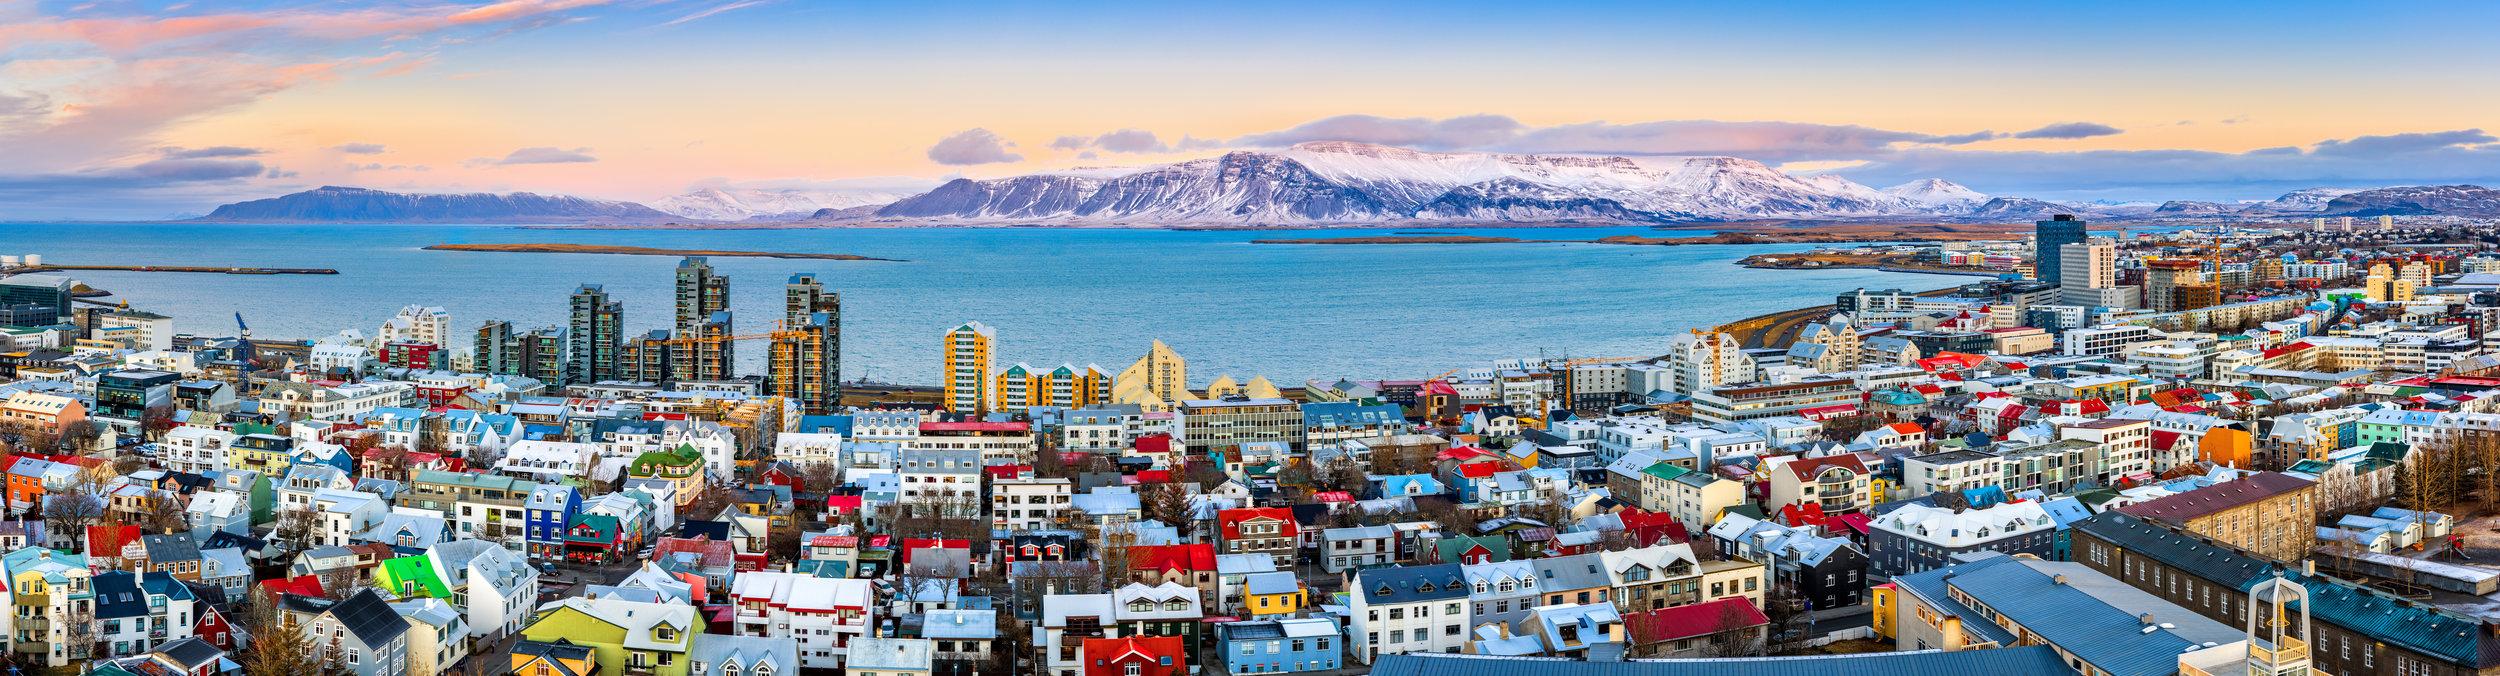 Reykjavík, vista panoramica